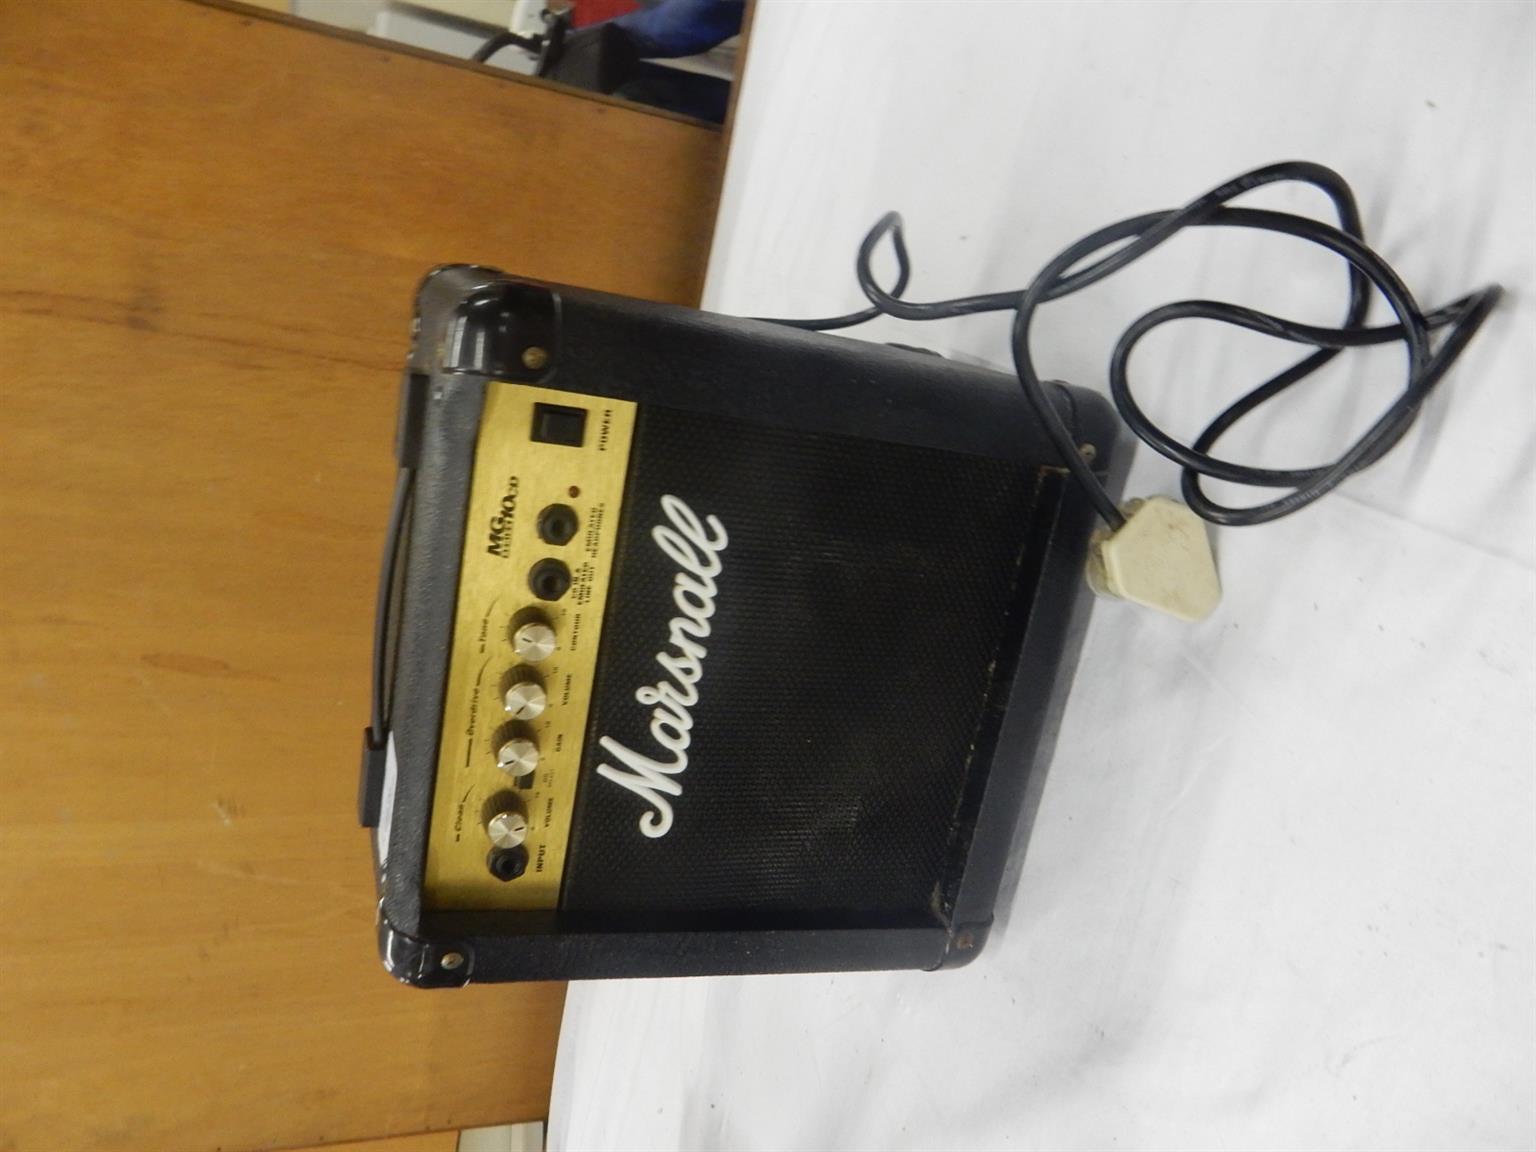 Marshall MG 10 CD Series Amplifier